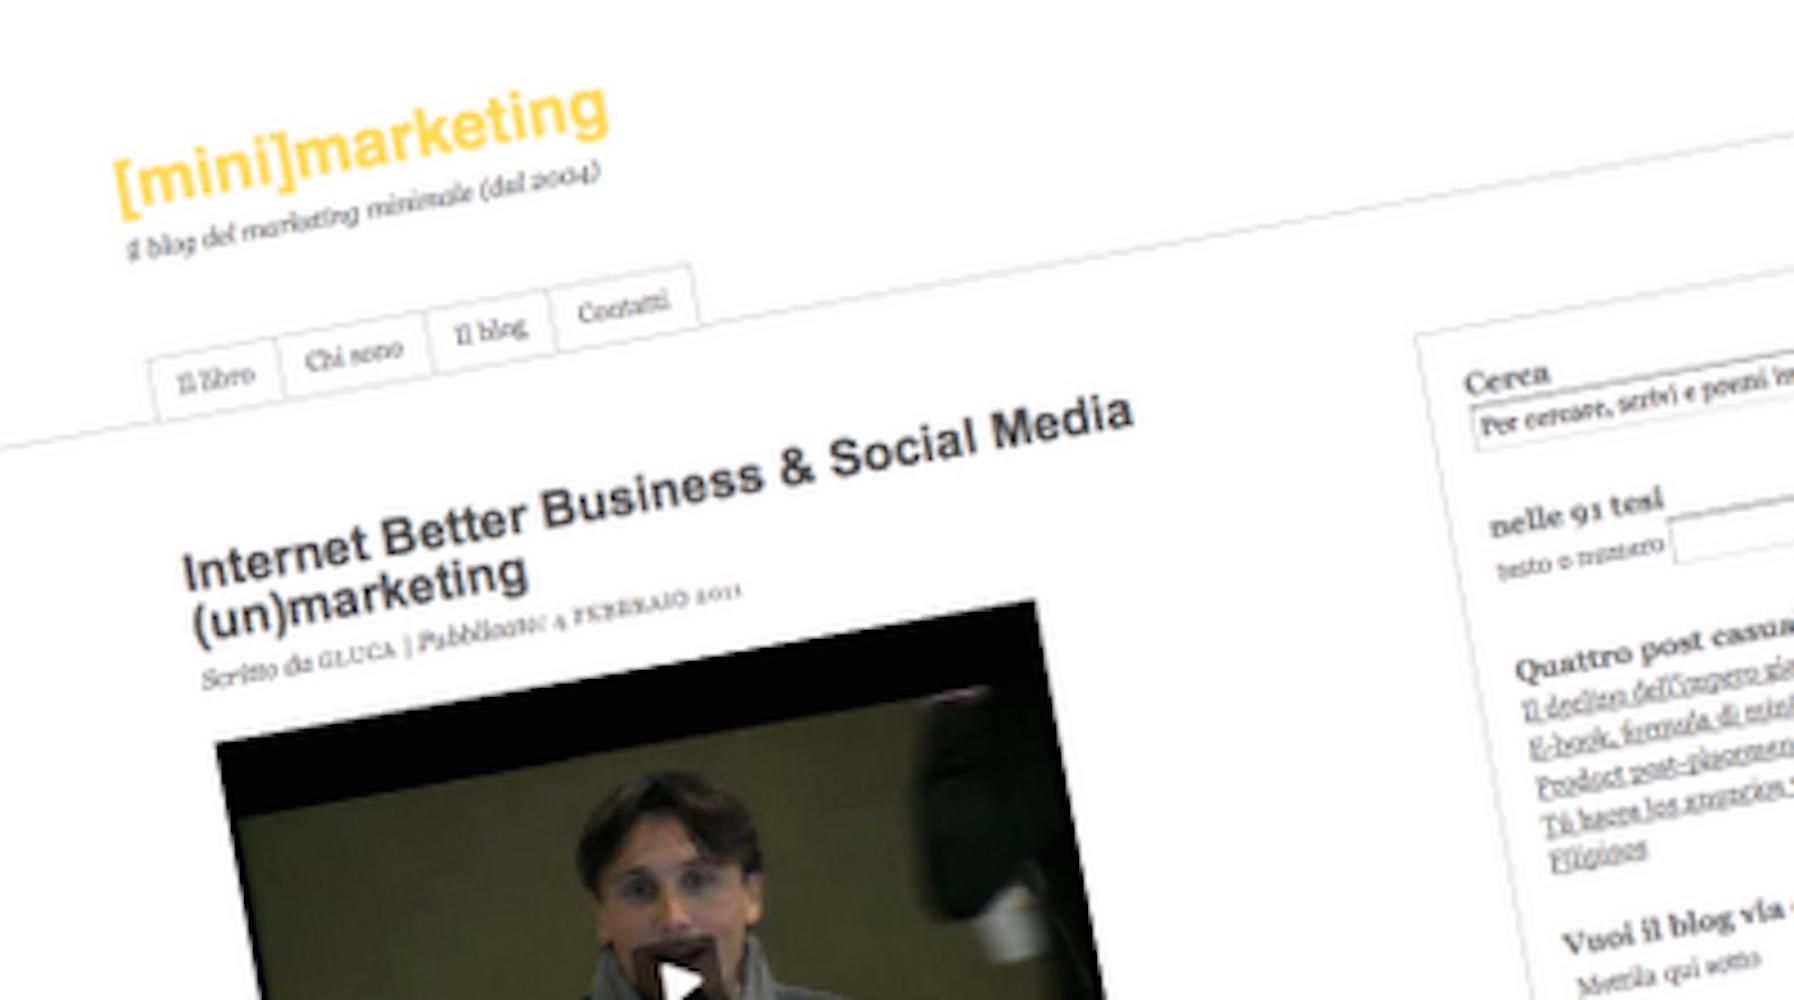 internet better business & social media marketing